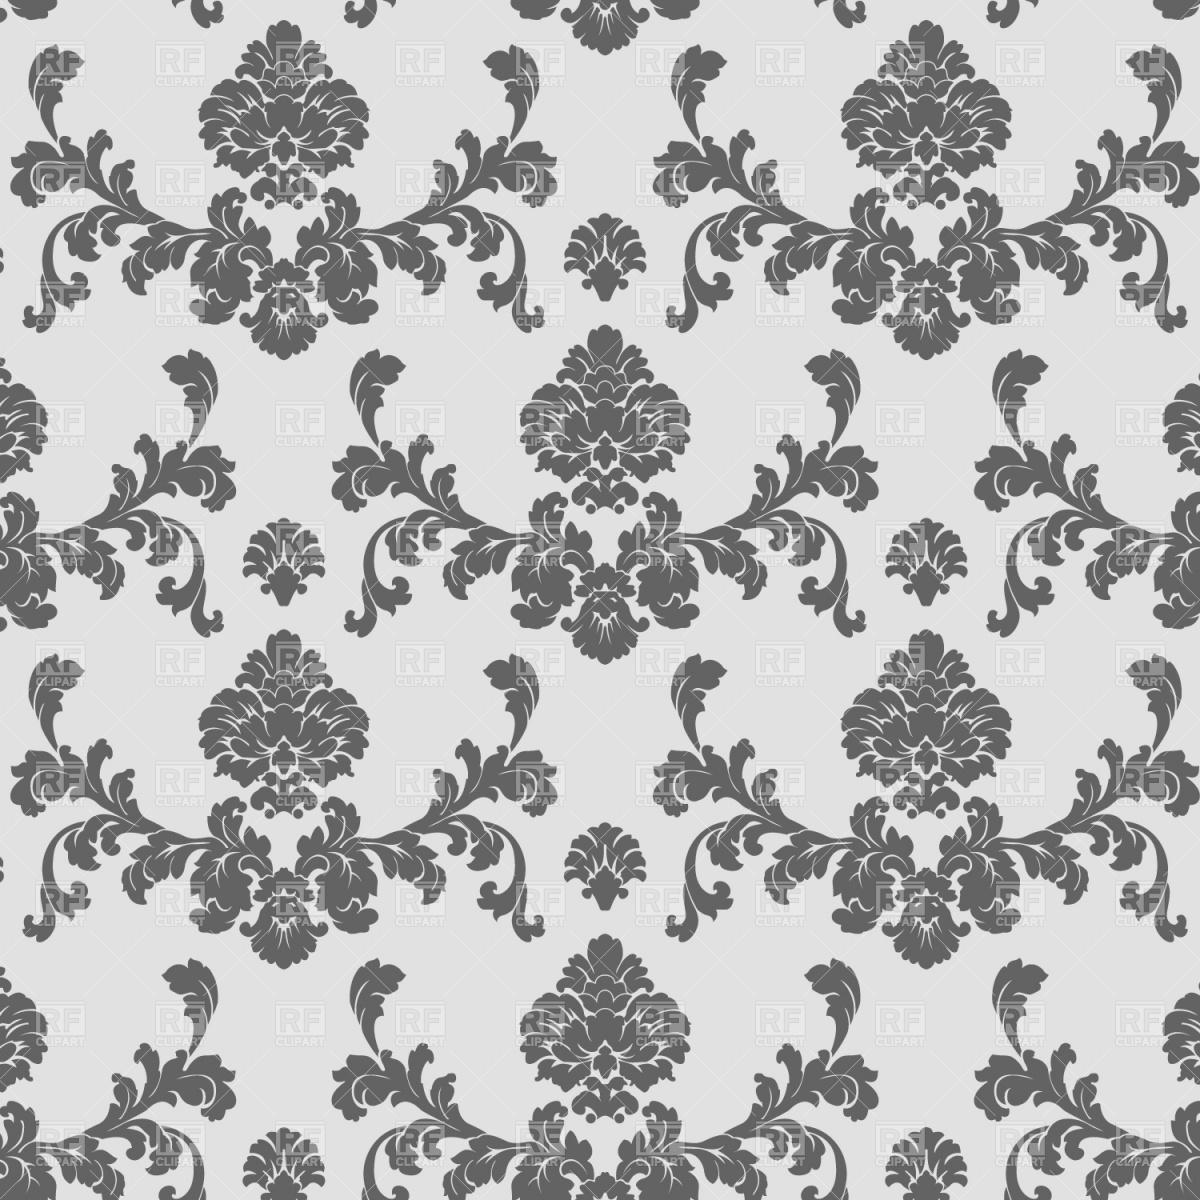 Seamless clipart pattern.